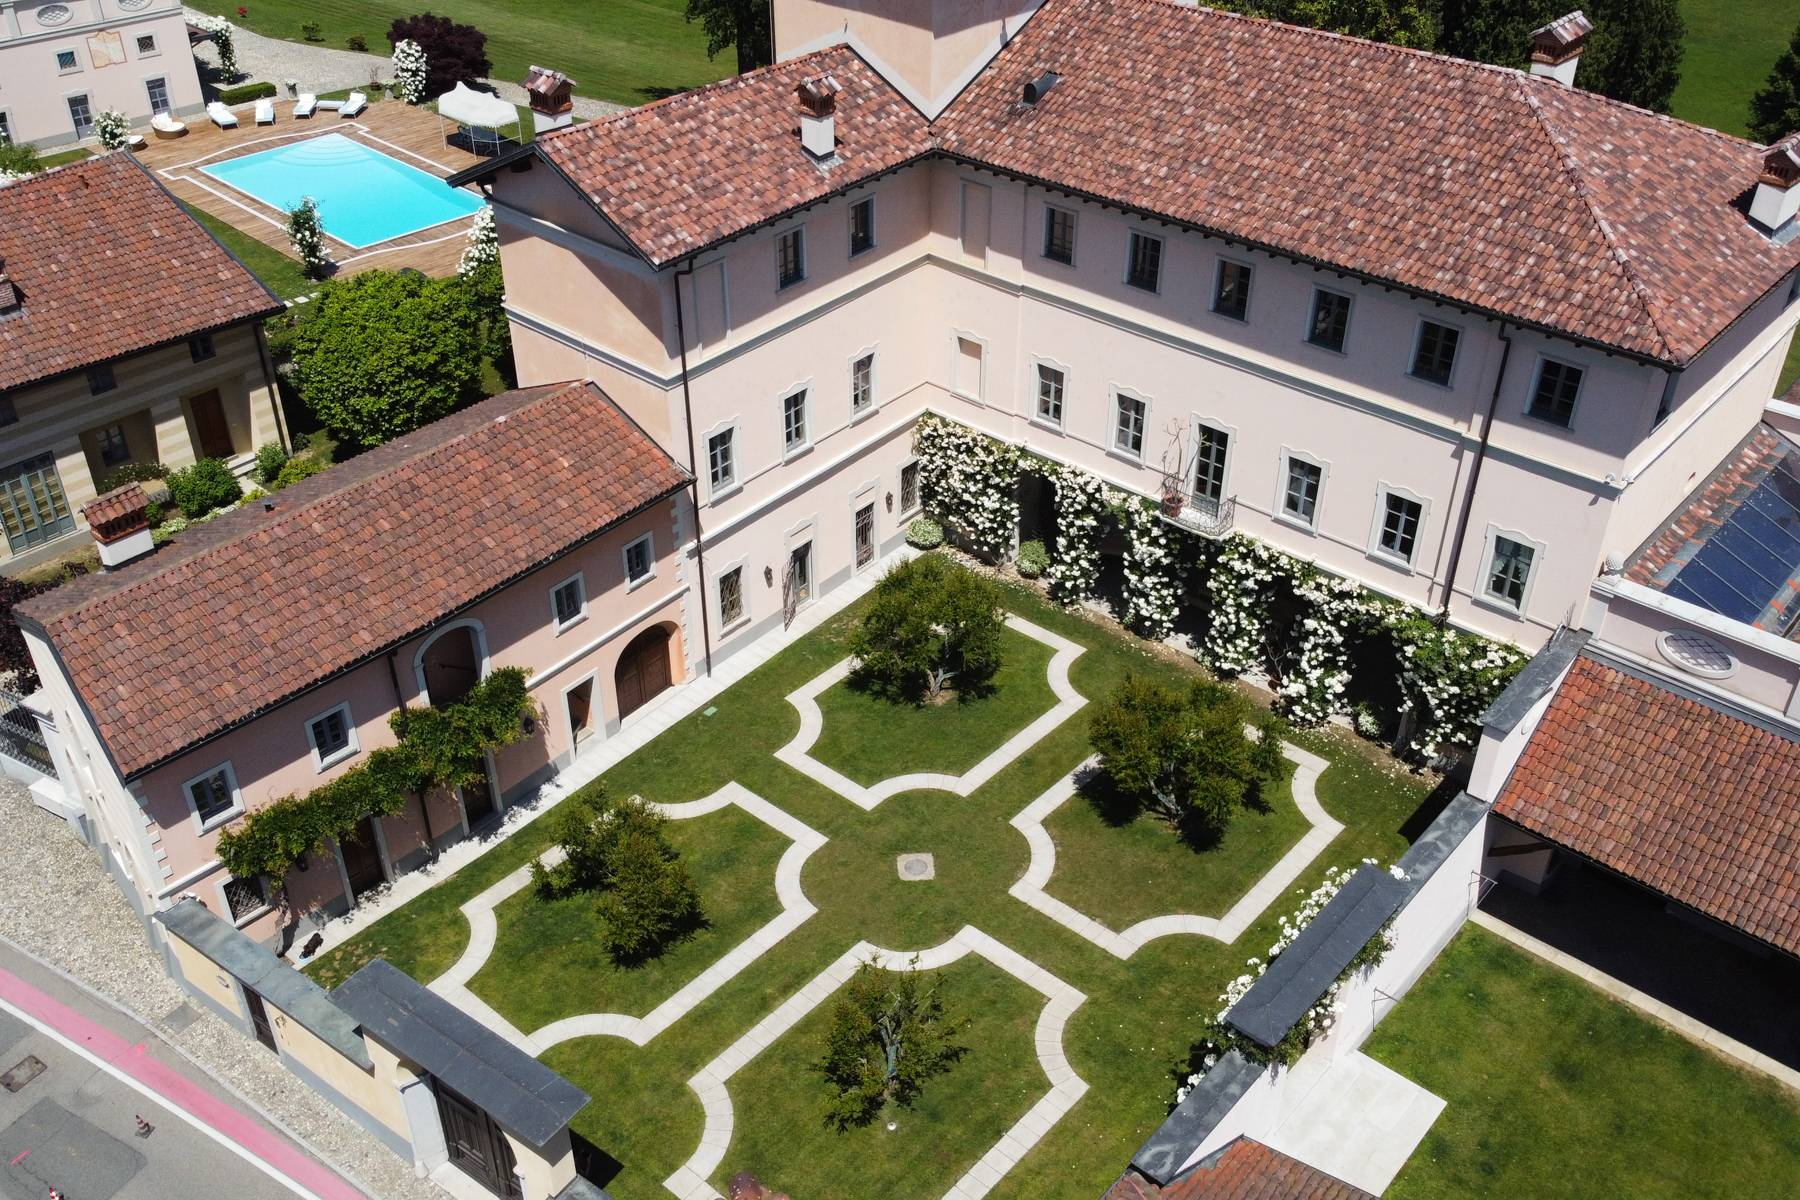 Antico Borgo Piemontese a due passi dal lago Maggiore - 45